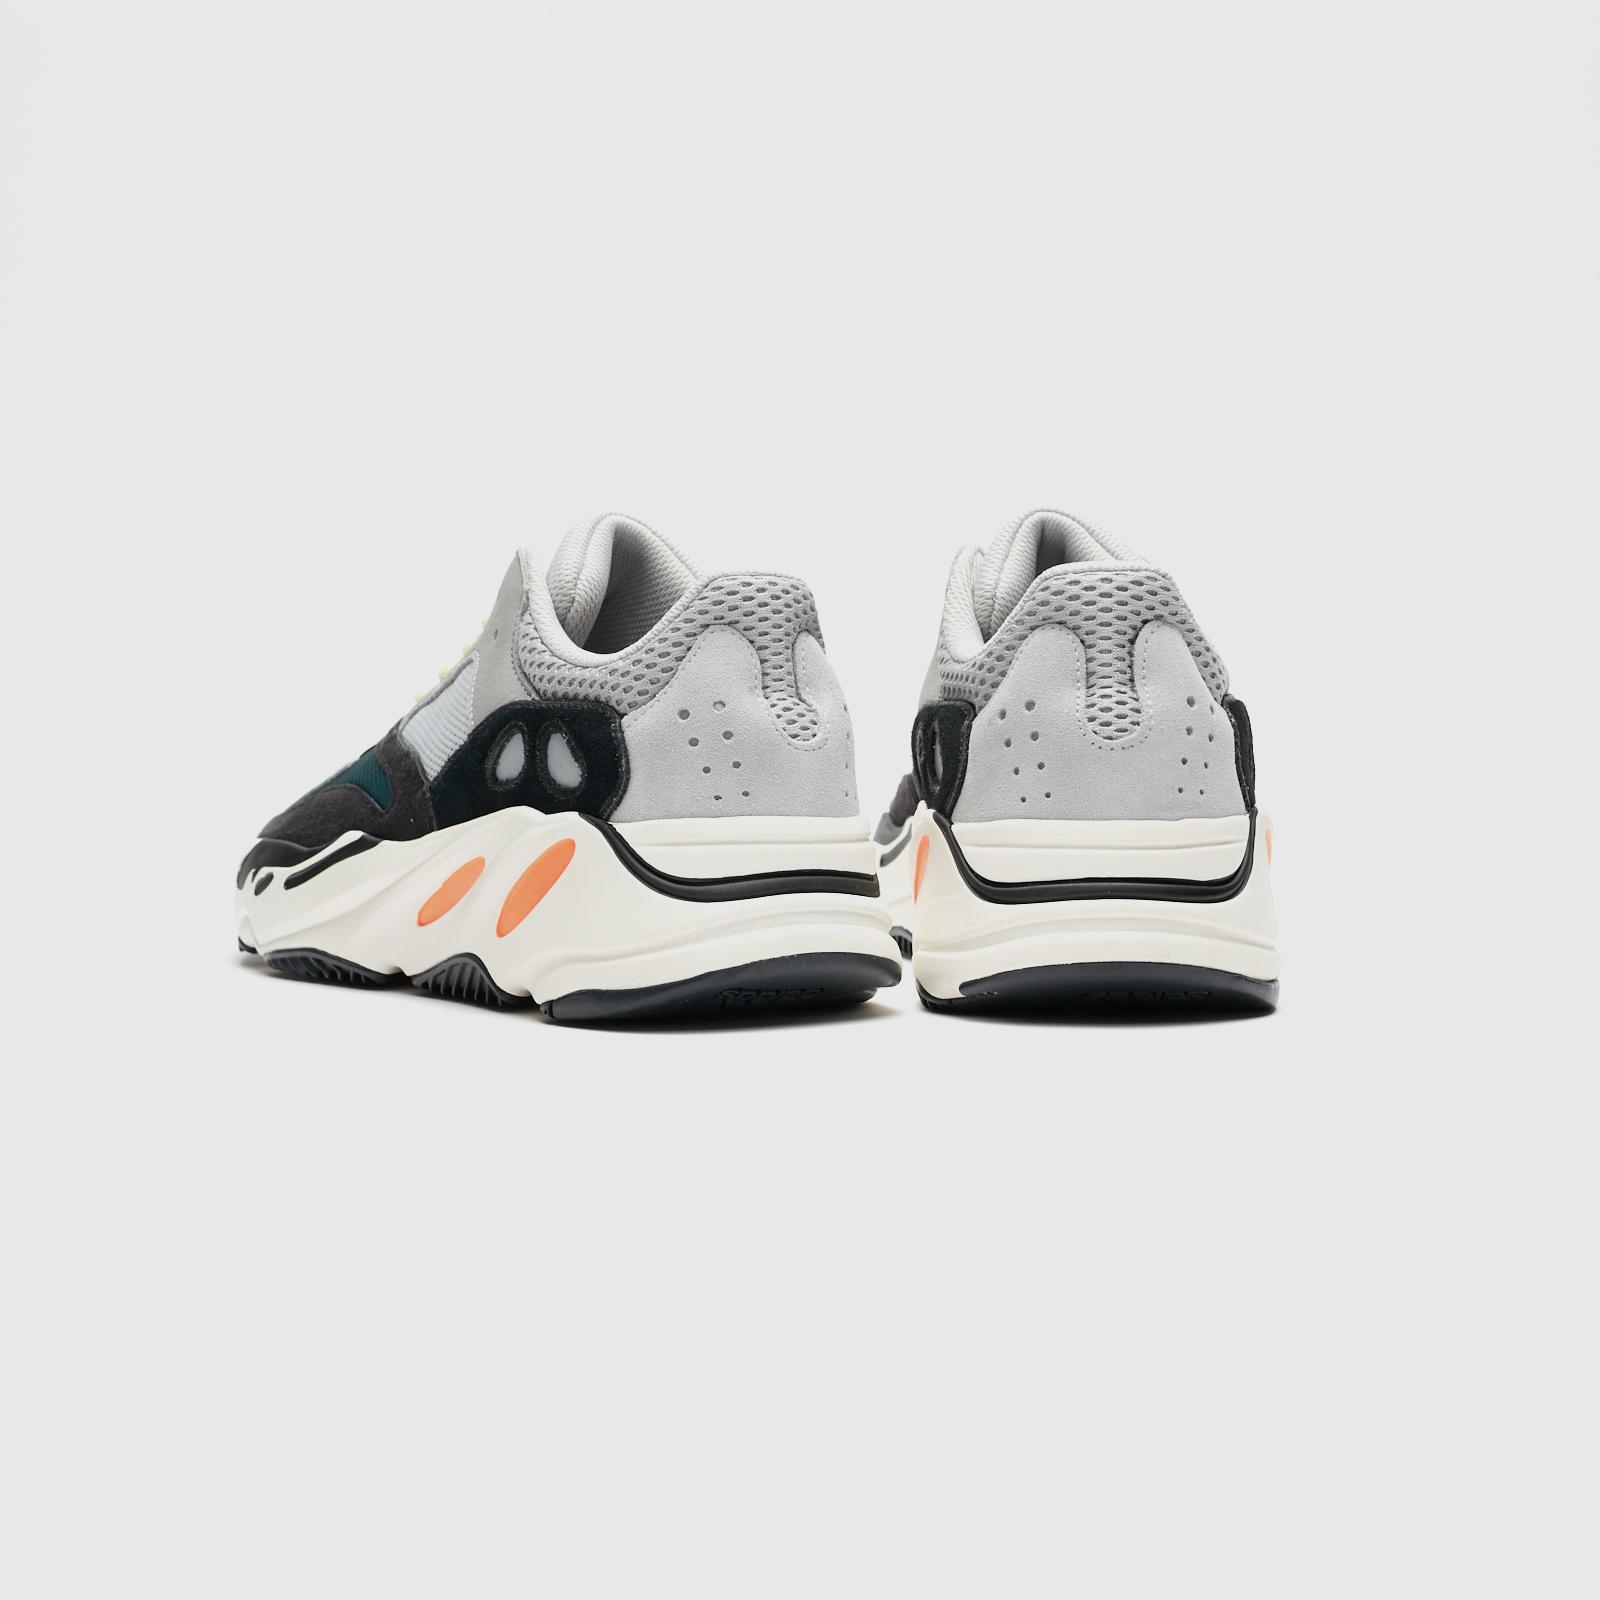 f199c9f3bdd45 adidas Yeezy Boost 700 - B75571 - Sneakersnstuff